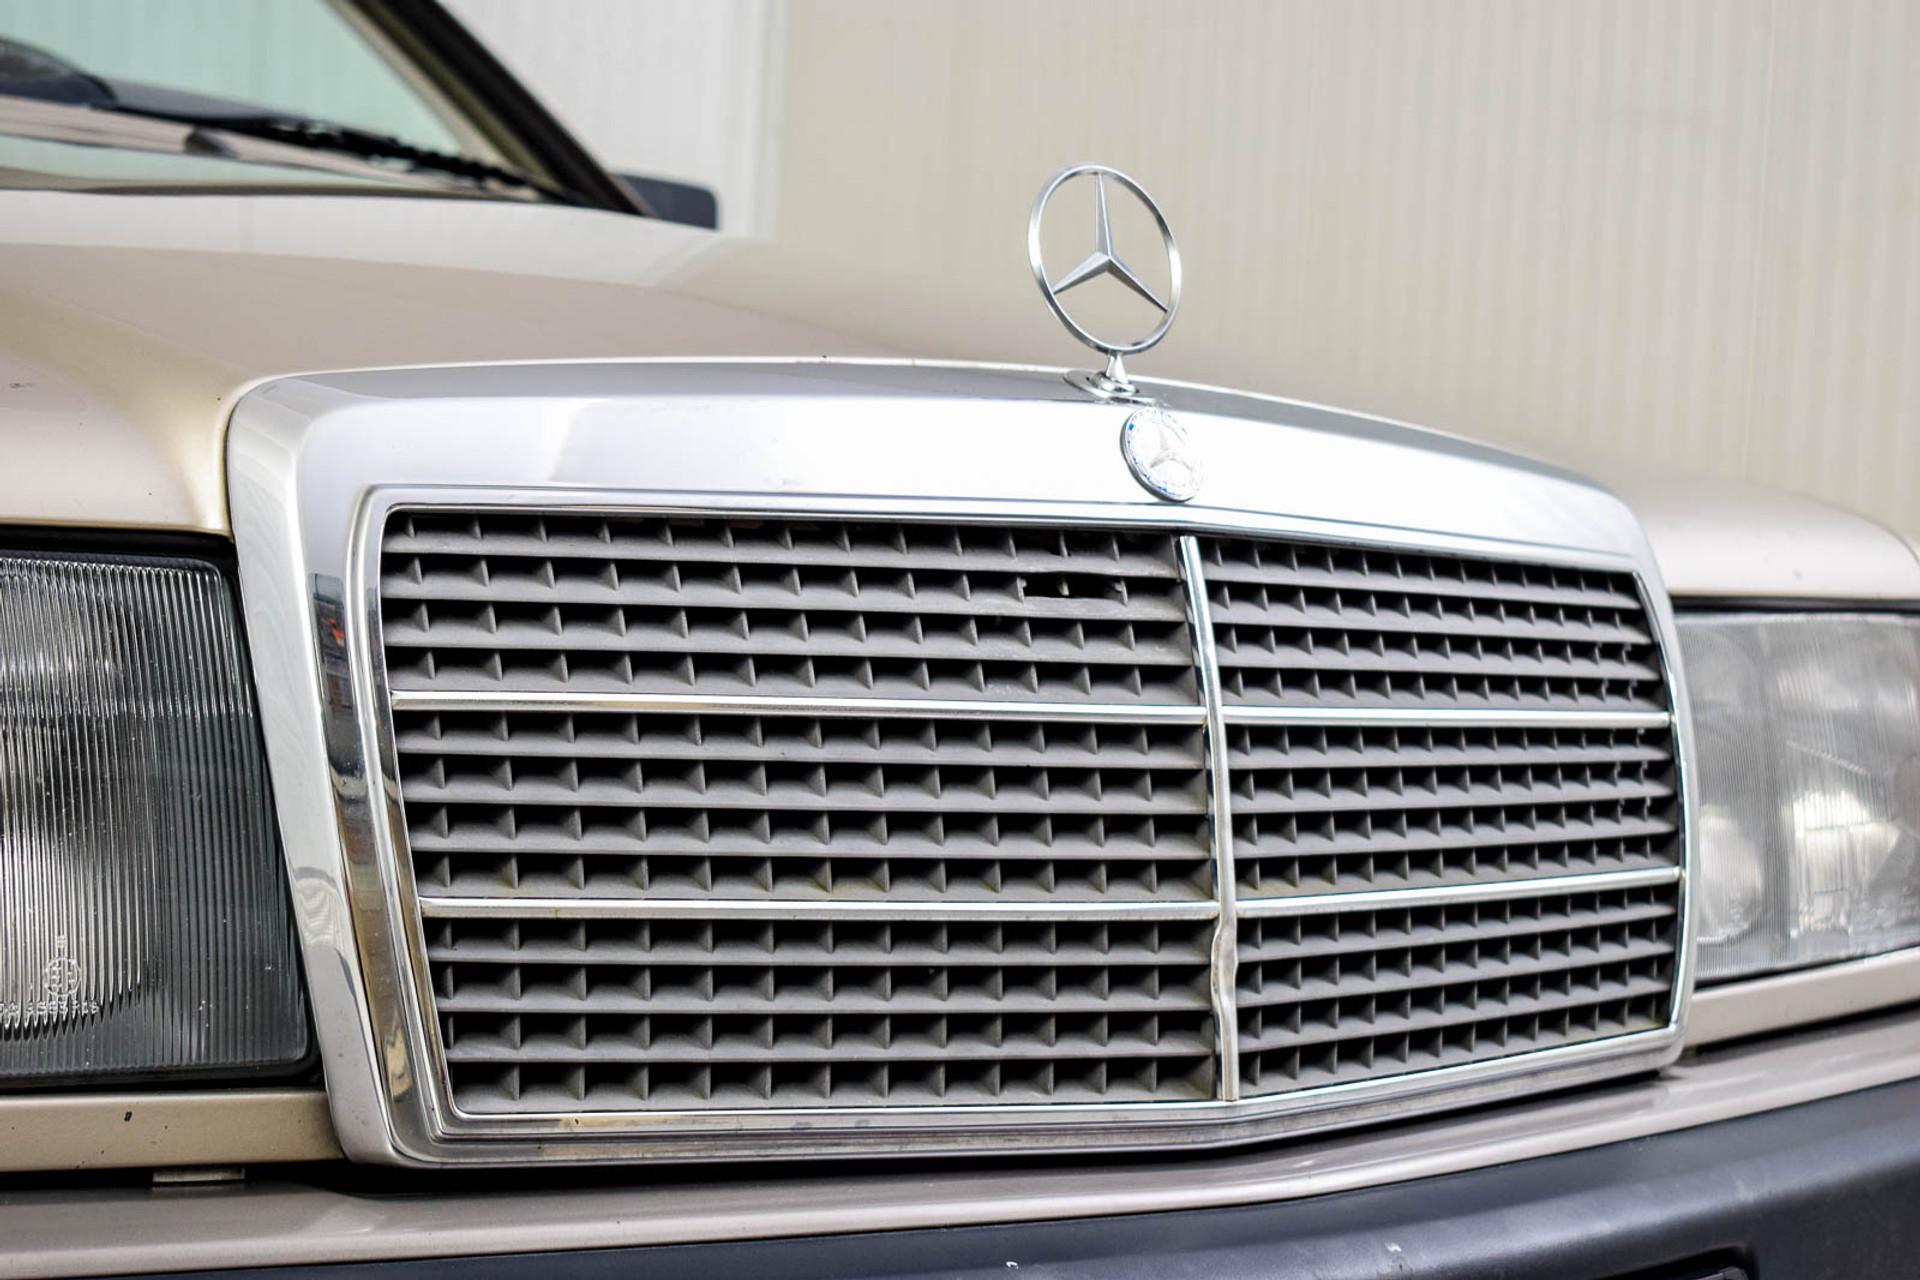 Mercedes-Benz 190 2.5 D Turbo Diesel Foto 20